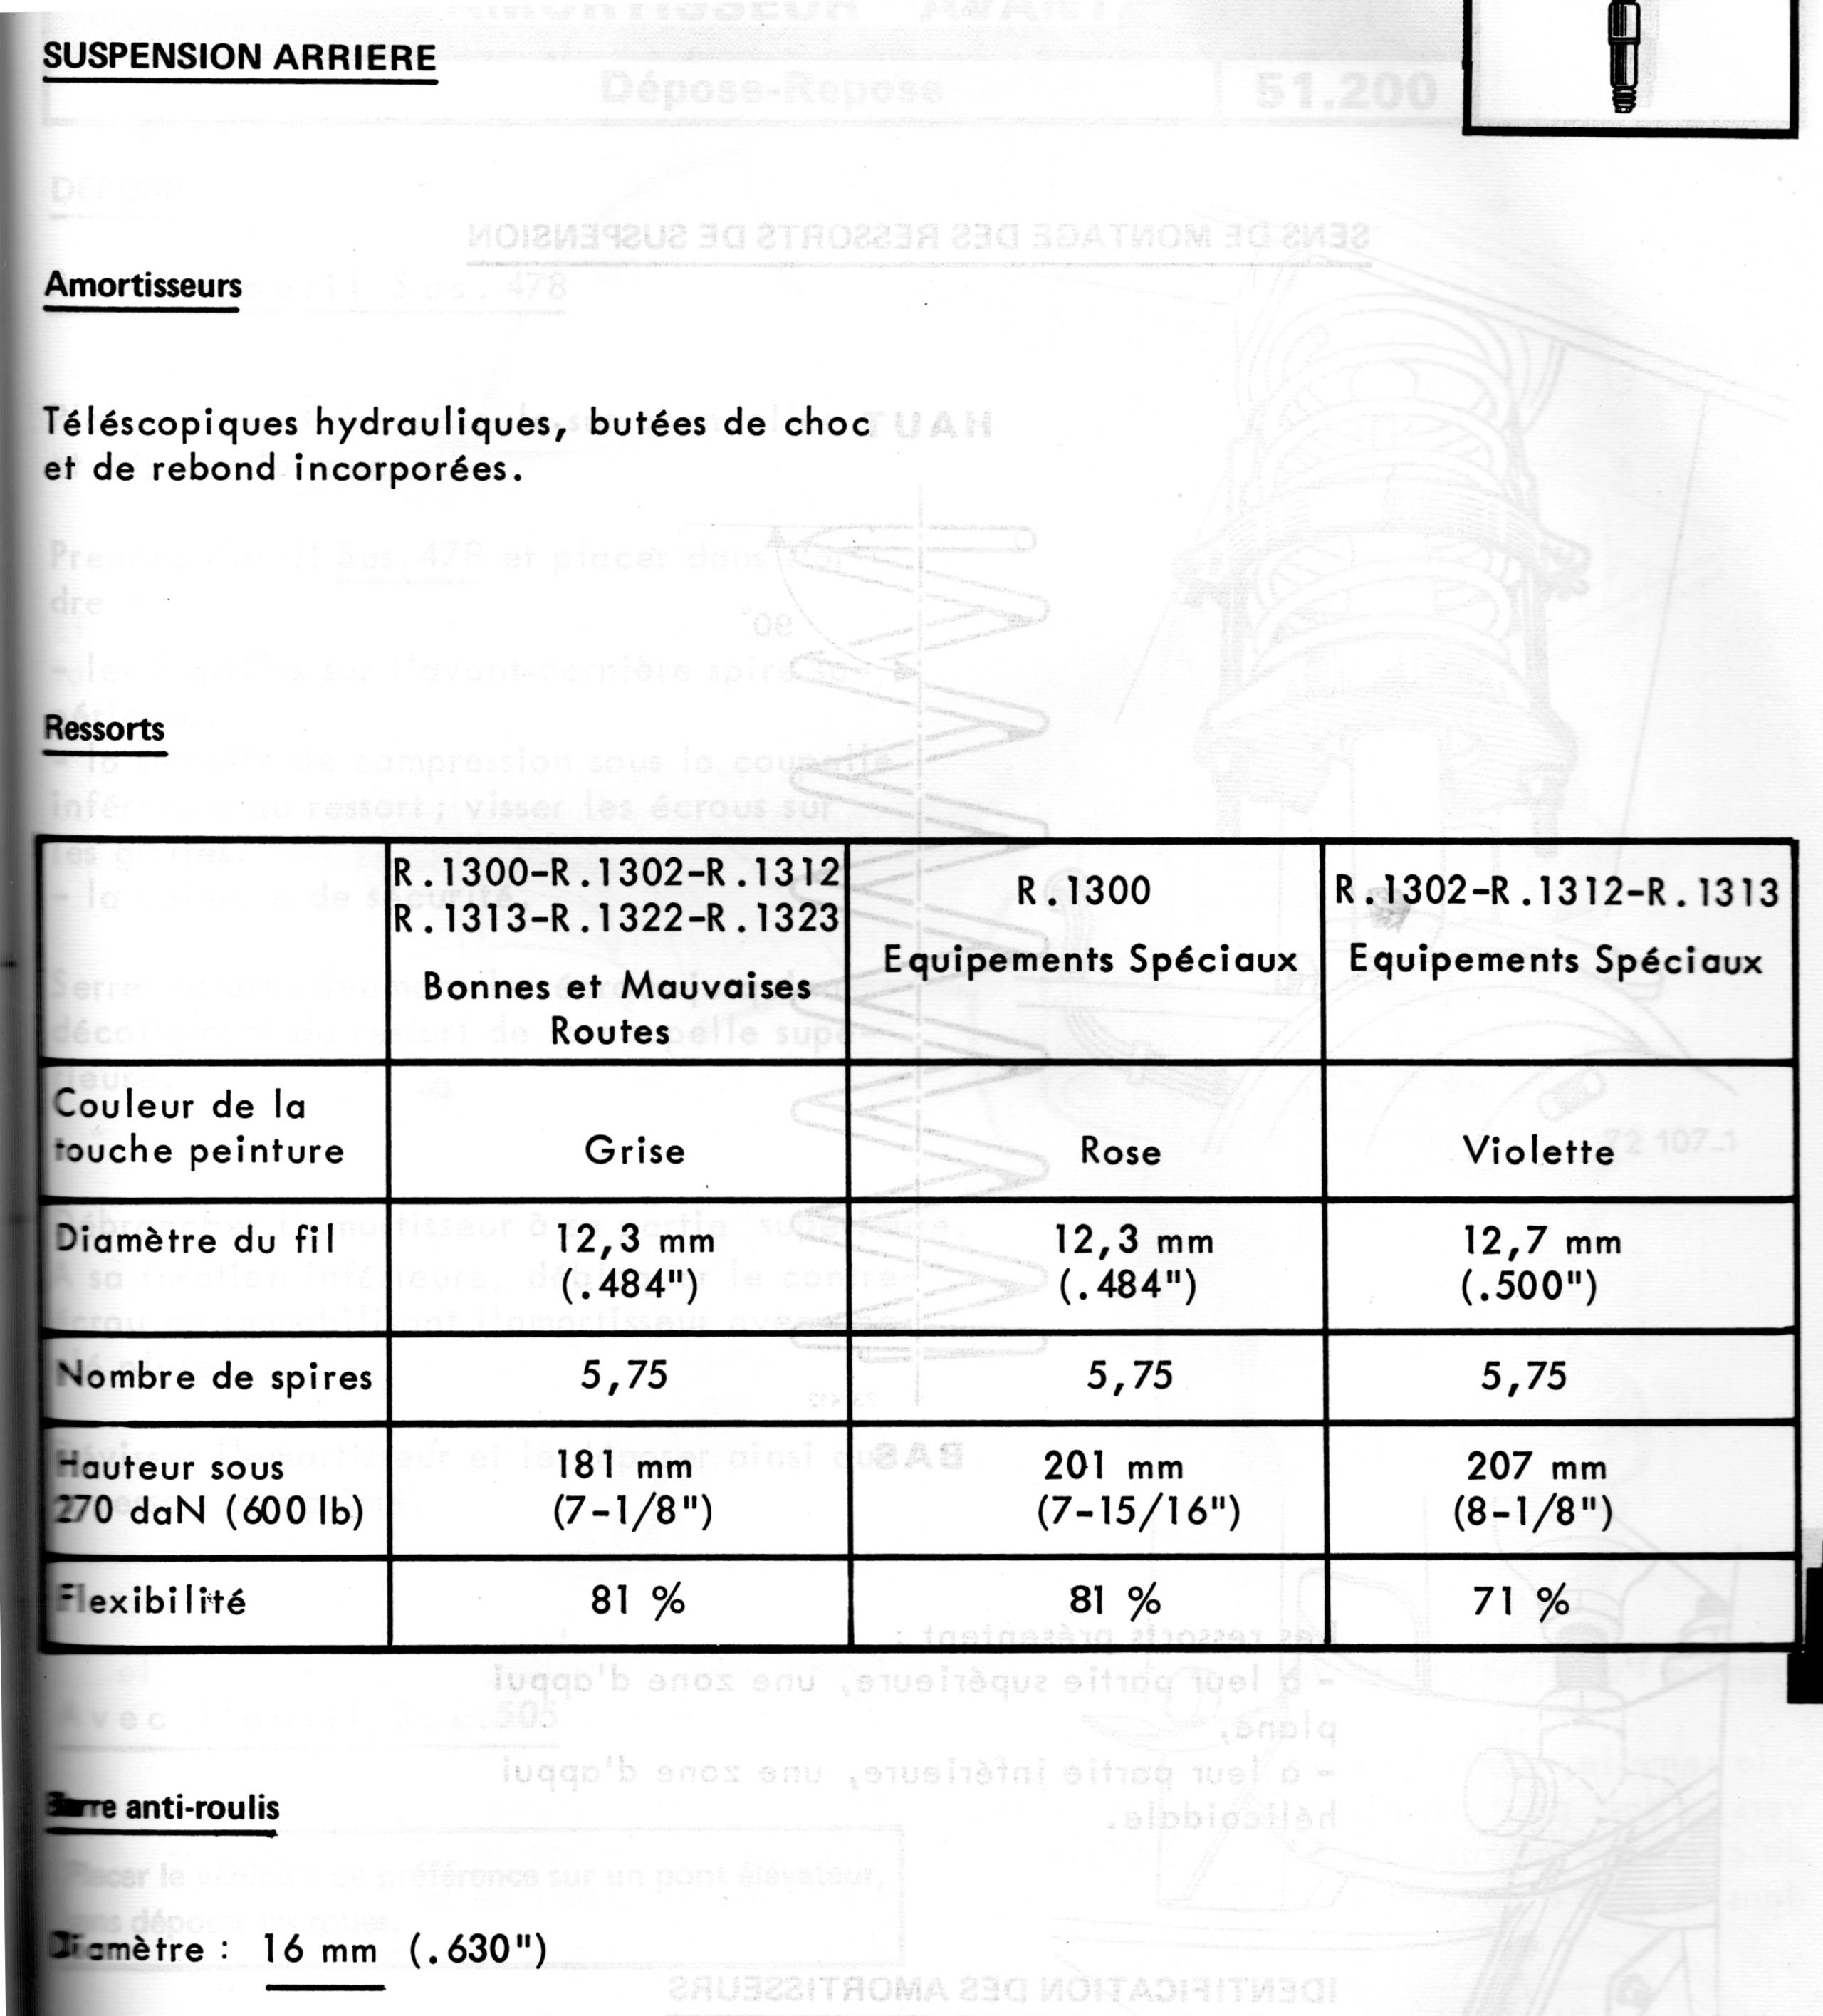 renault 12 tl 1971 - Page 2 Ressor12